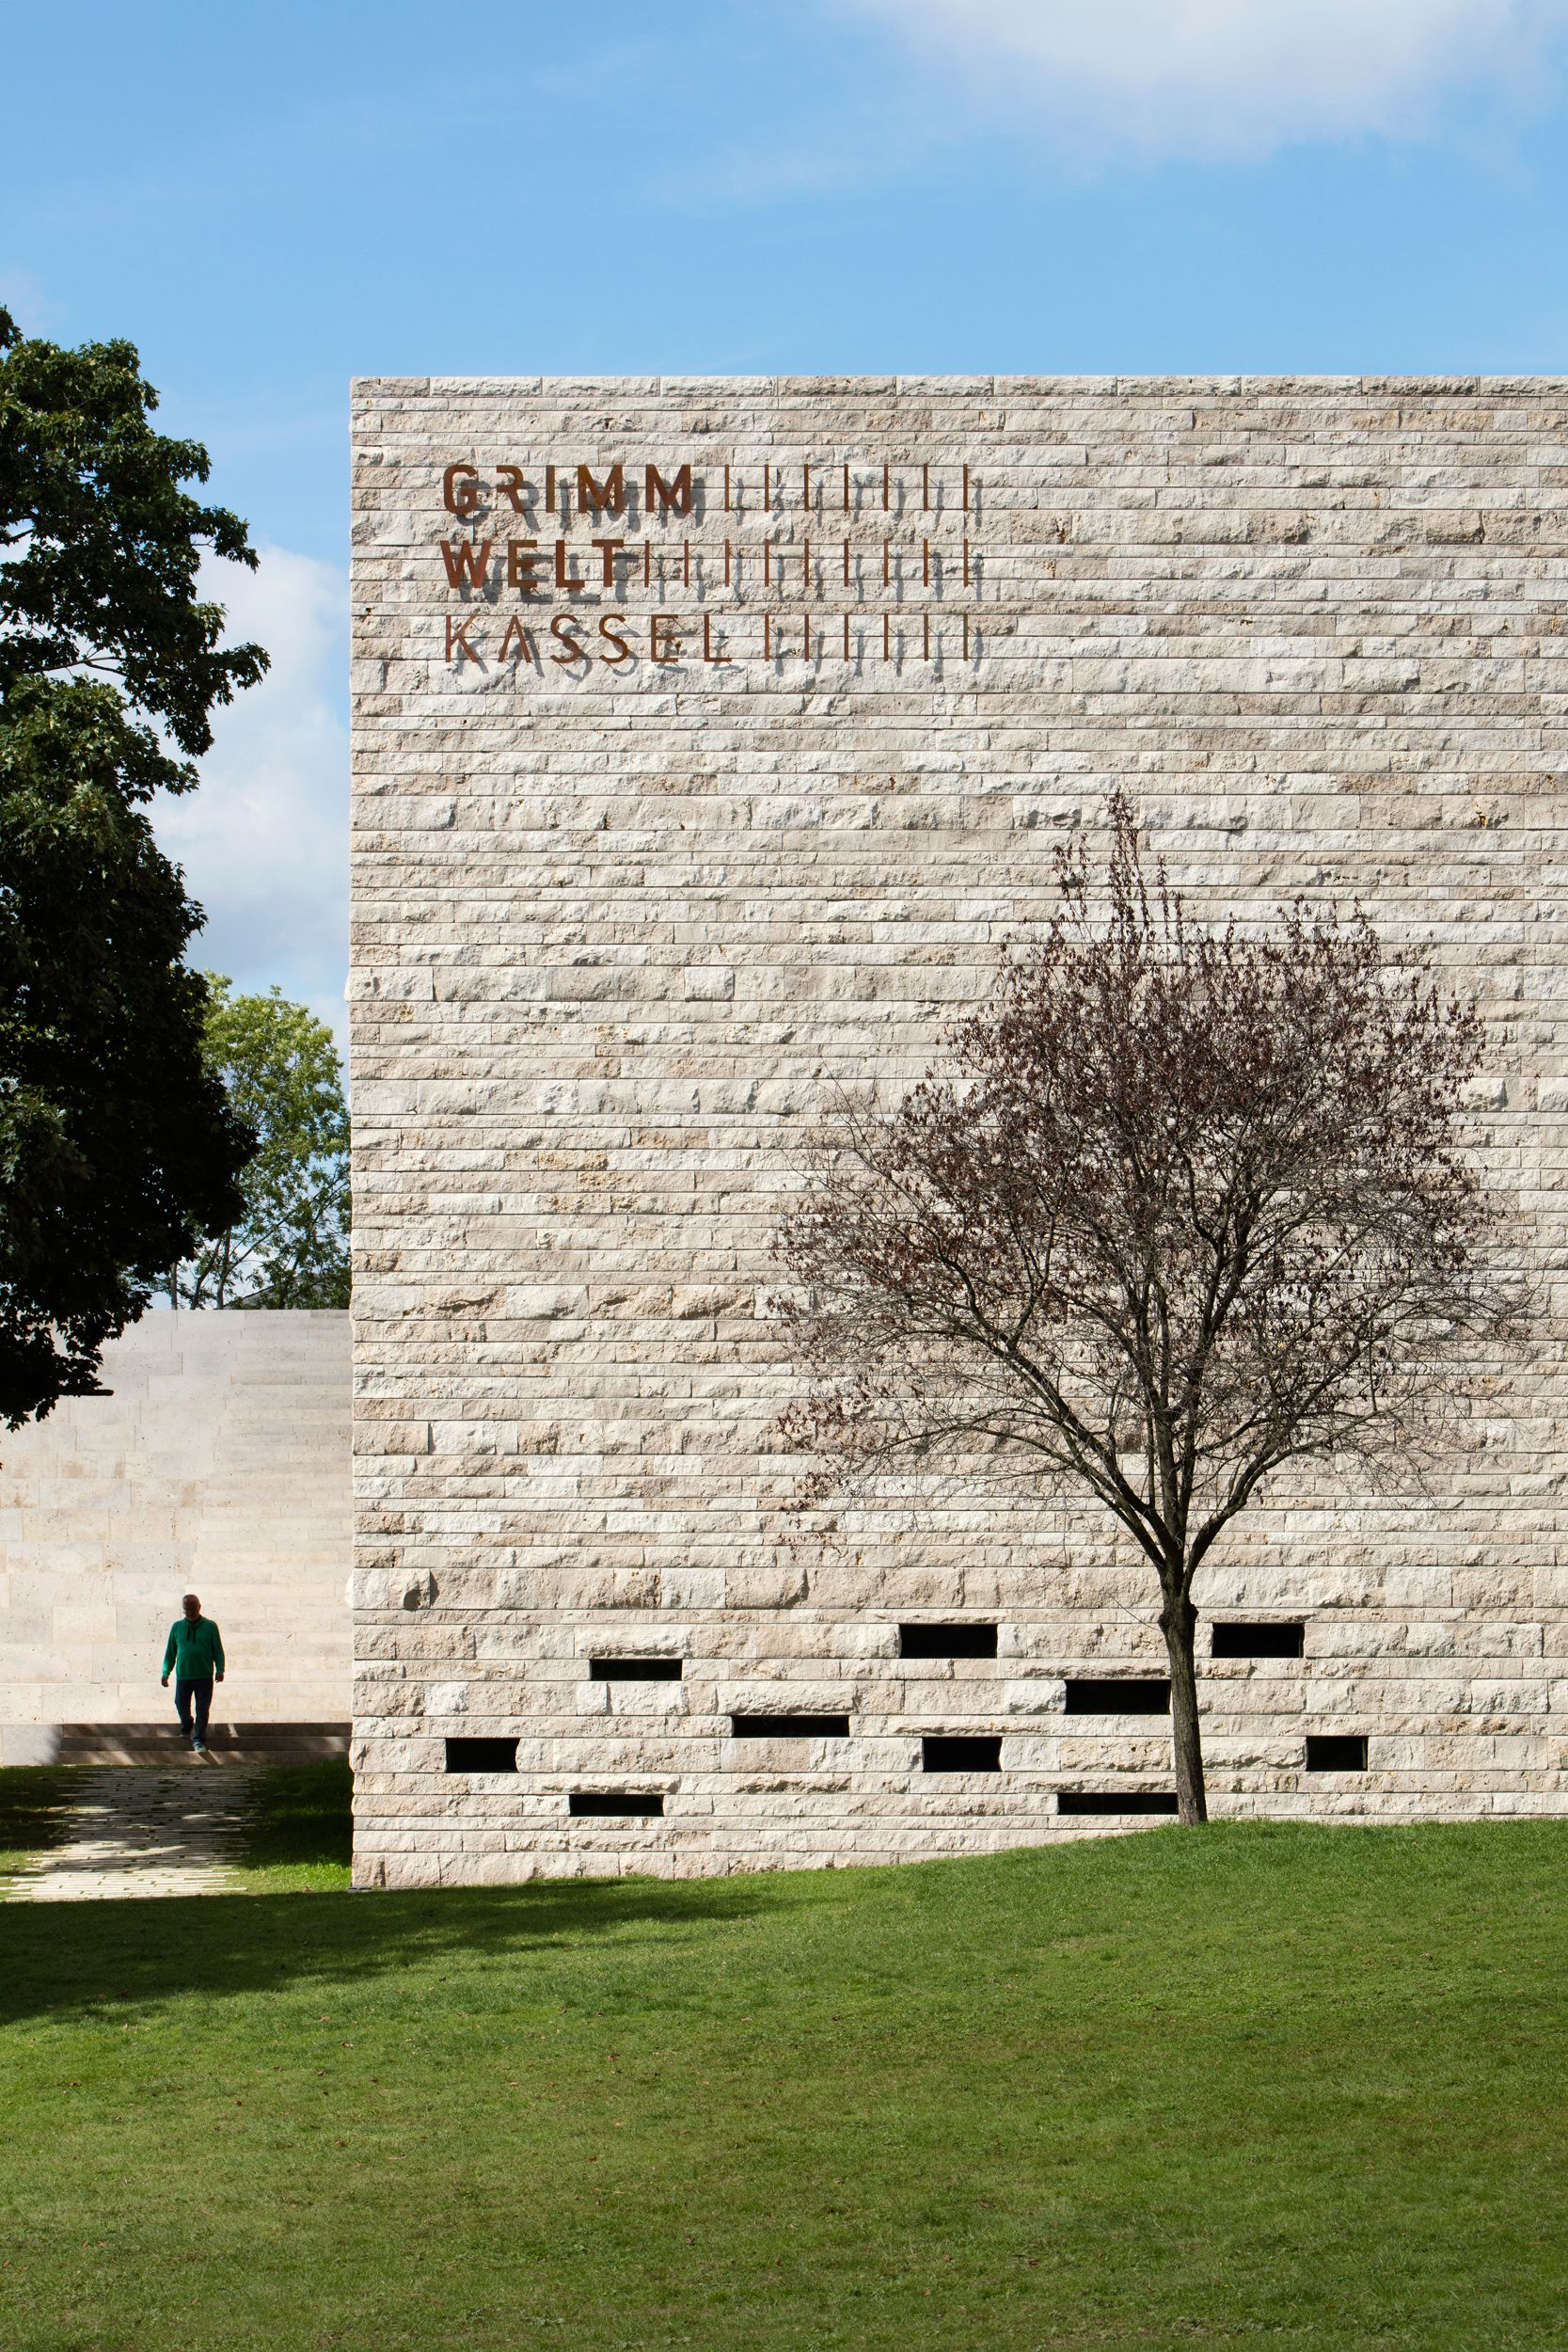 Innenarchitektur Kassel märchenhafter rundgang grimmwelt in kassel kassel